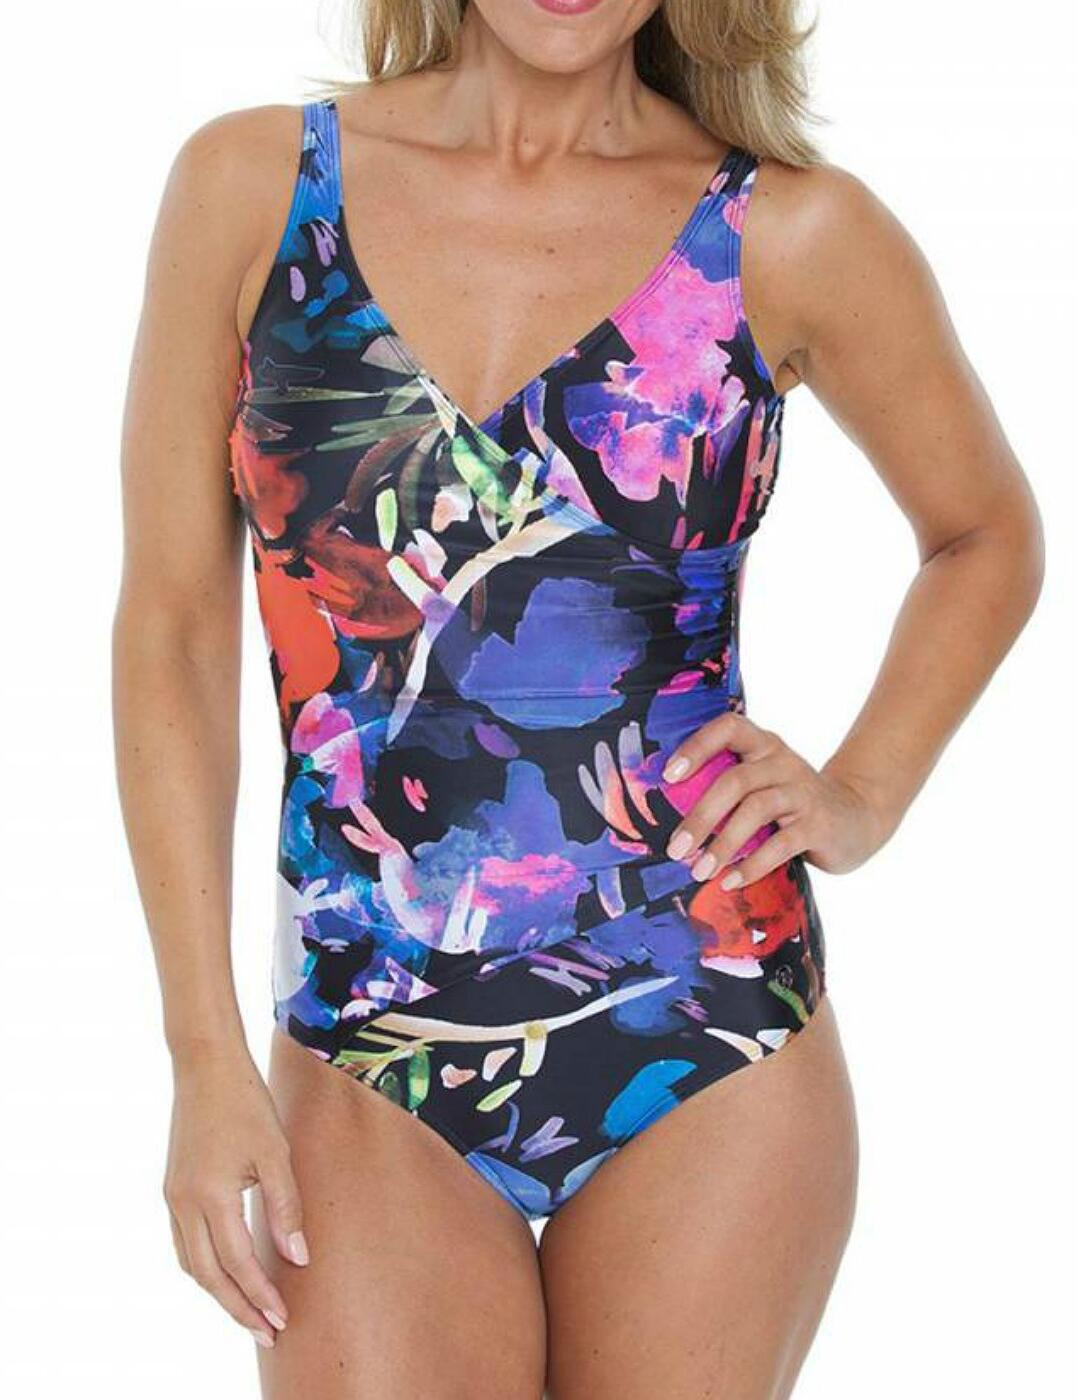 16-2067 SeaSpray Rio Wrap Strap Swimsuit - 16-2067 Black/Multi